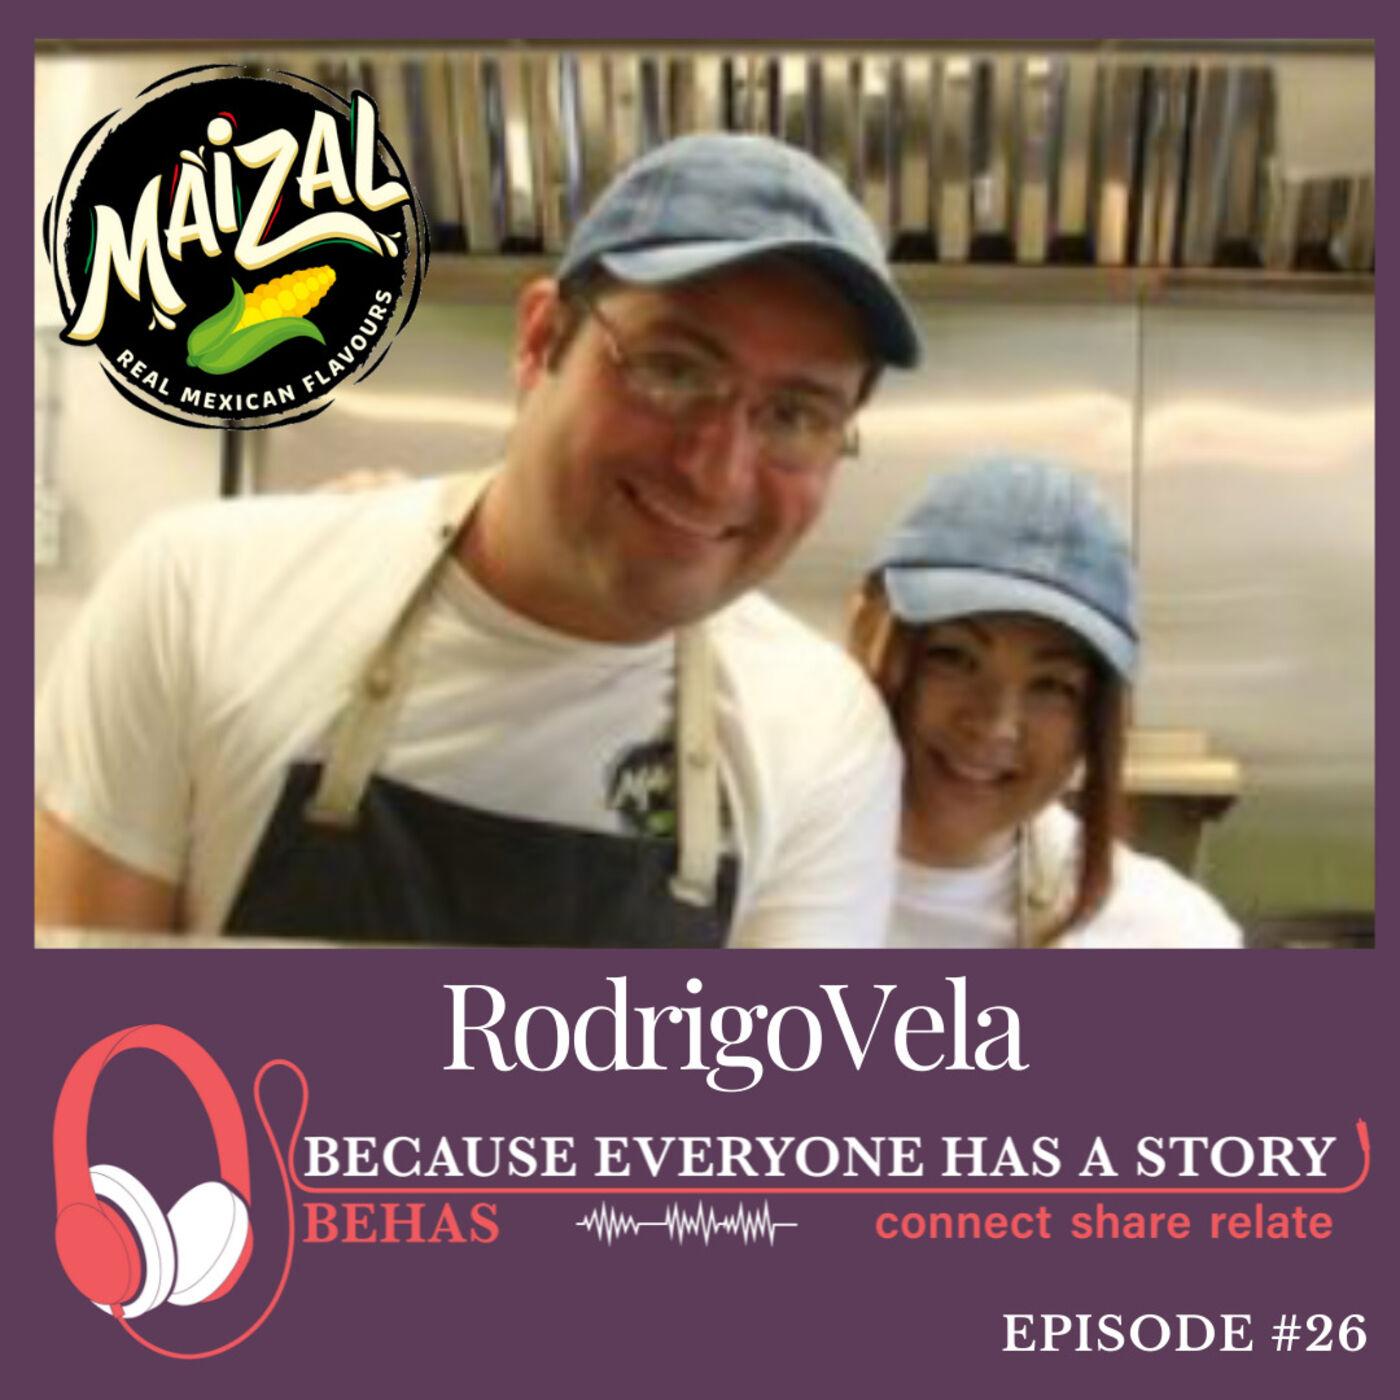 #26 - The Creation of Maizal, a Popular Mexican Restaurant in Vancouver - Rodrigo Vela